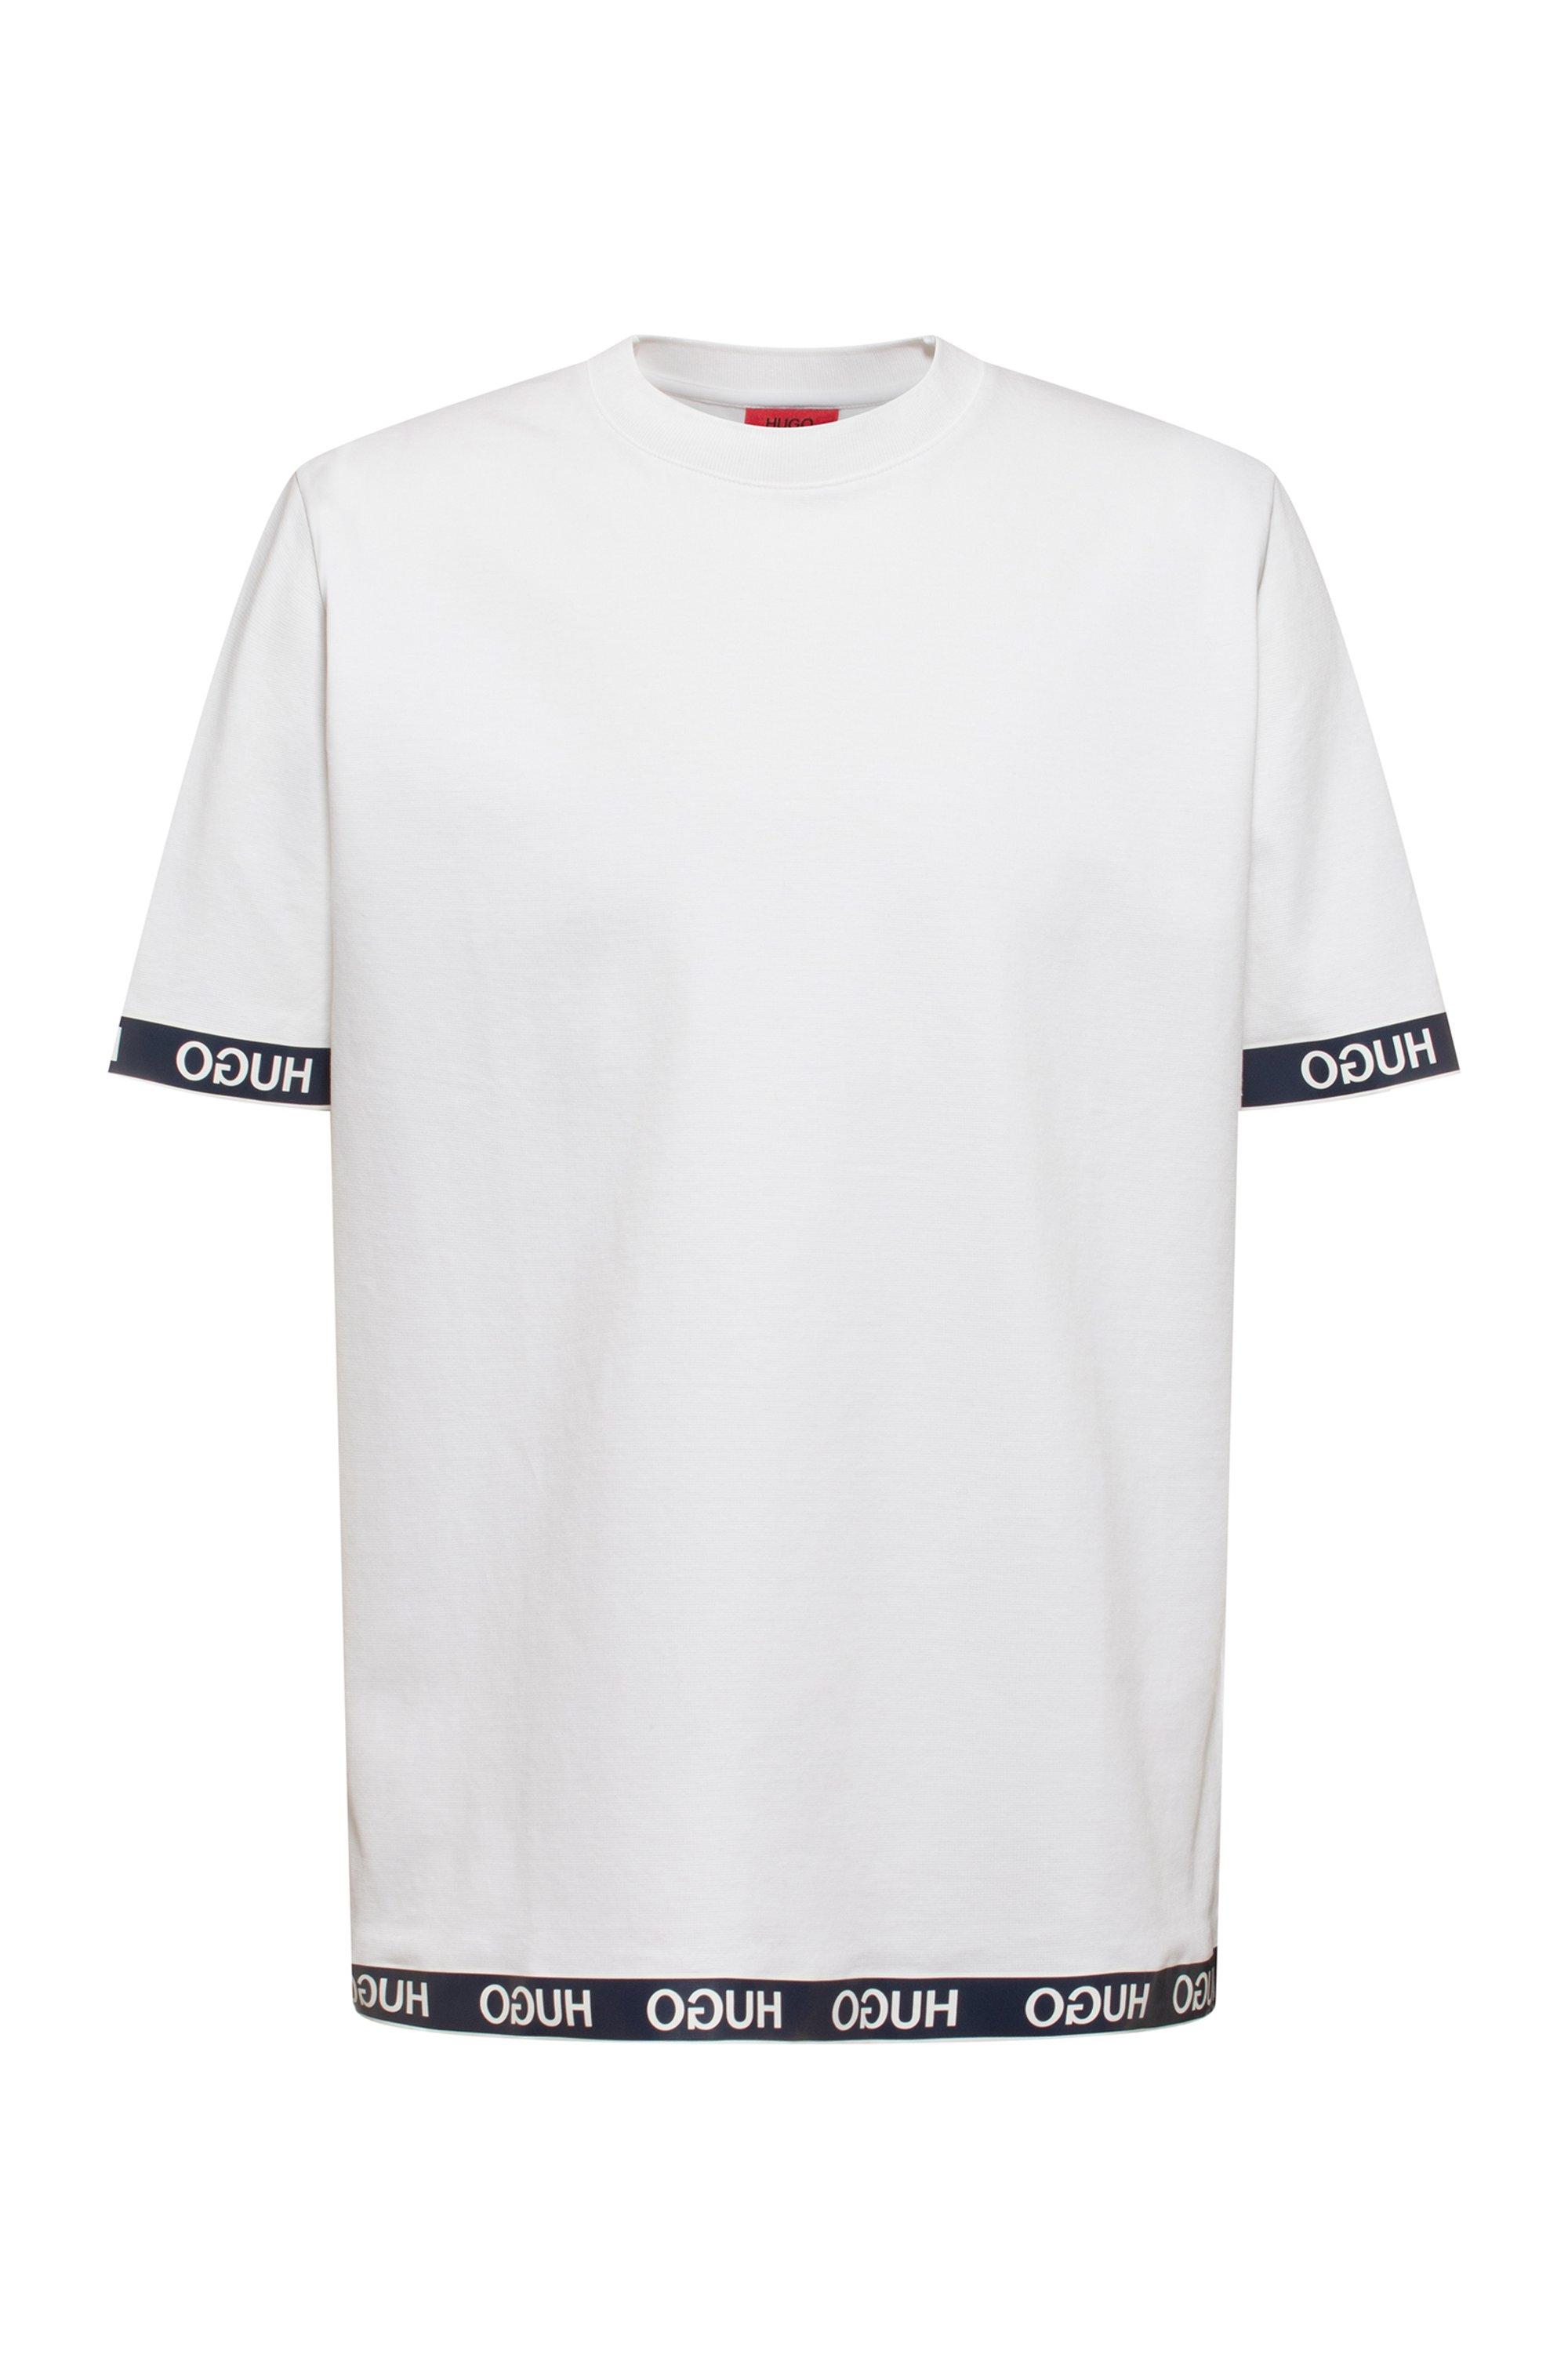 Cotton-blend T-shirt with logo cuffs and hem, White